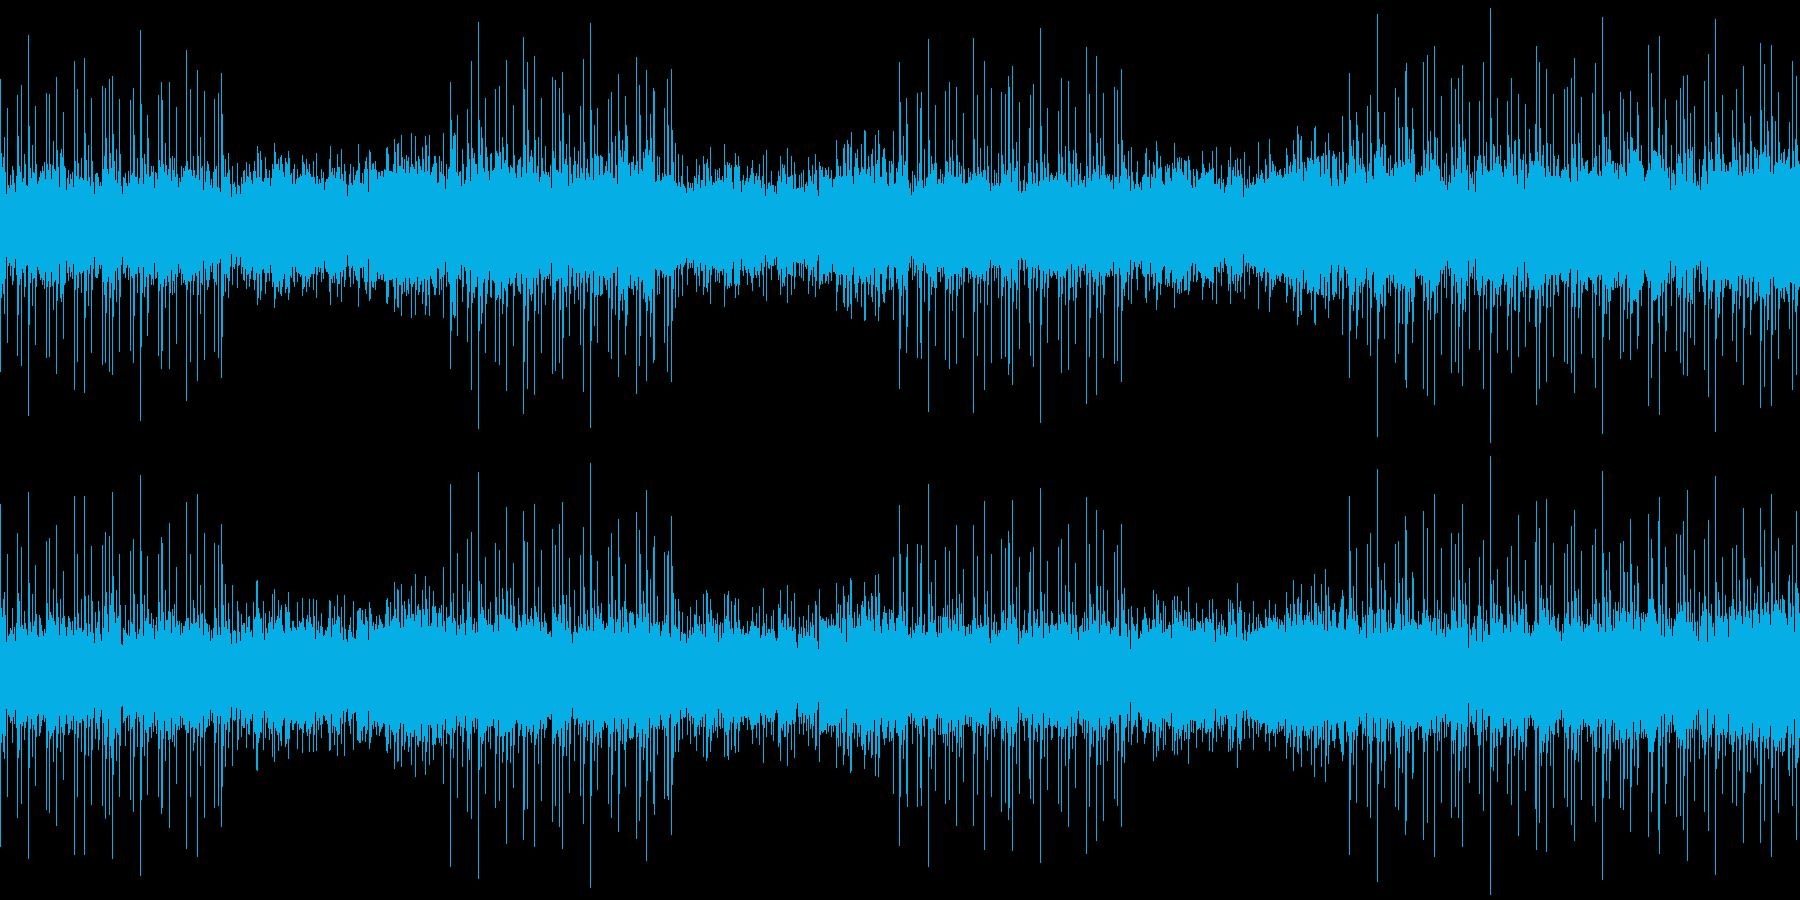 108bpm、Bb-Maj、アルペジオの再生済みの波形